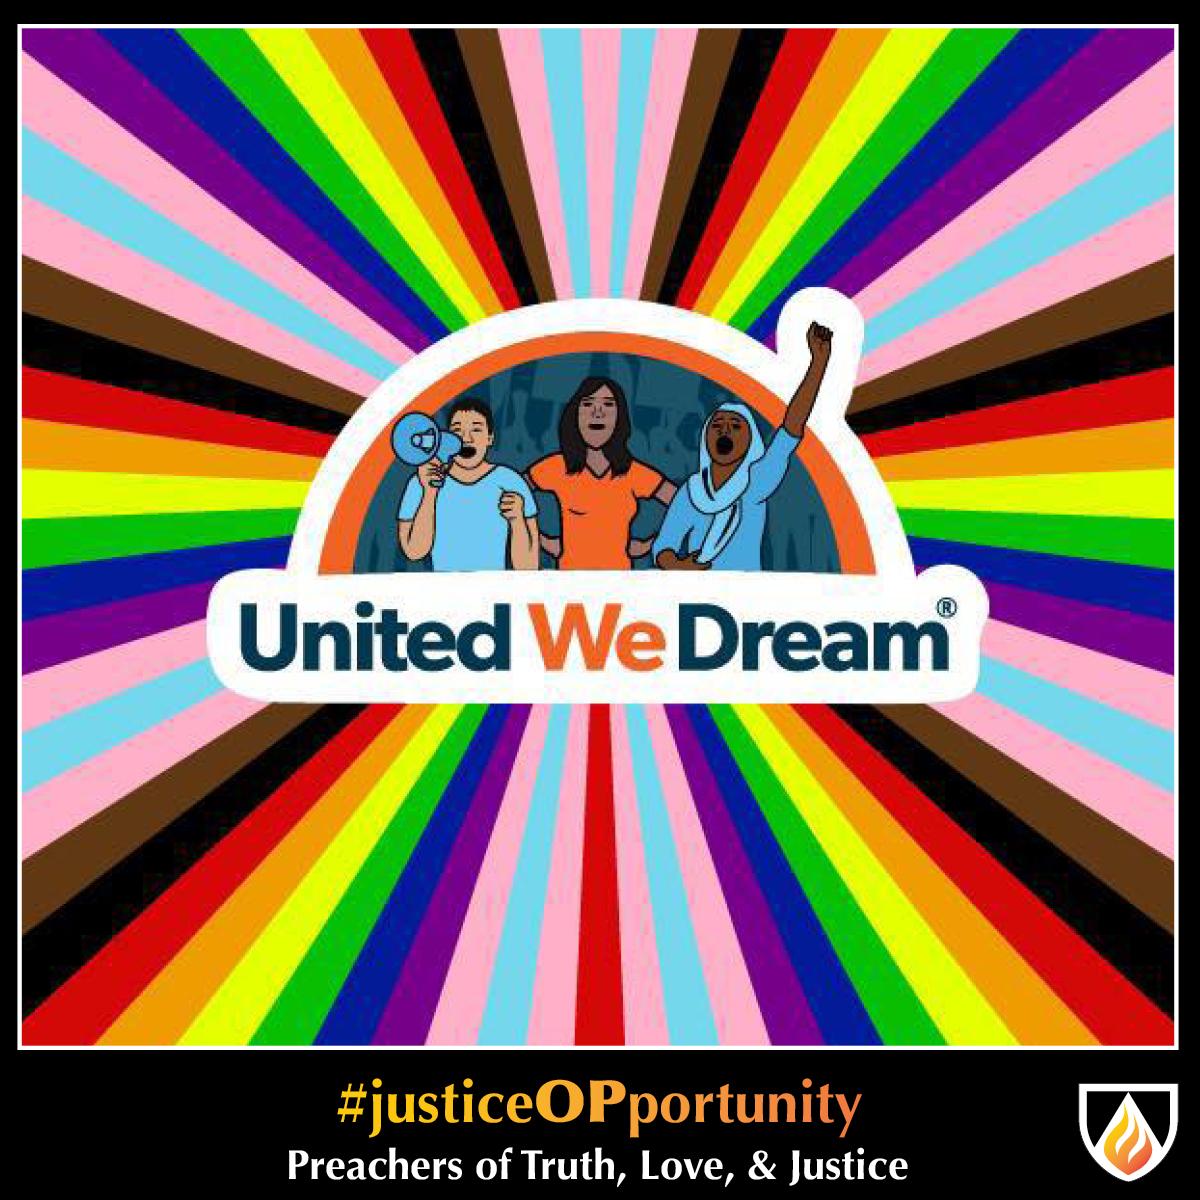 justiceOPportunityThursday: April 2, 2020